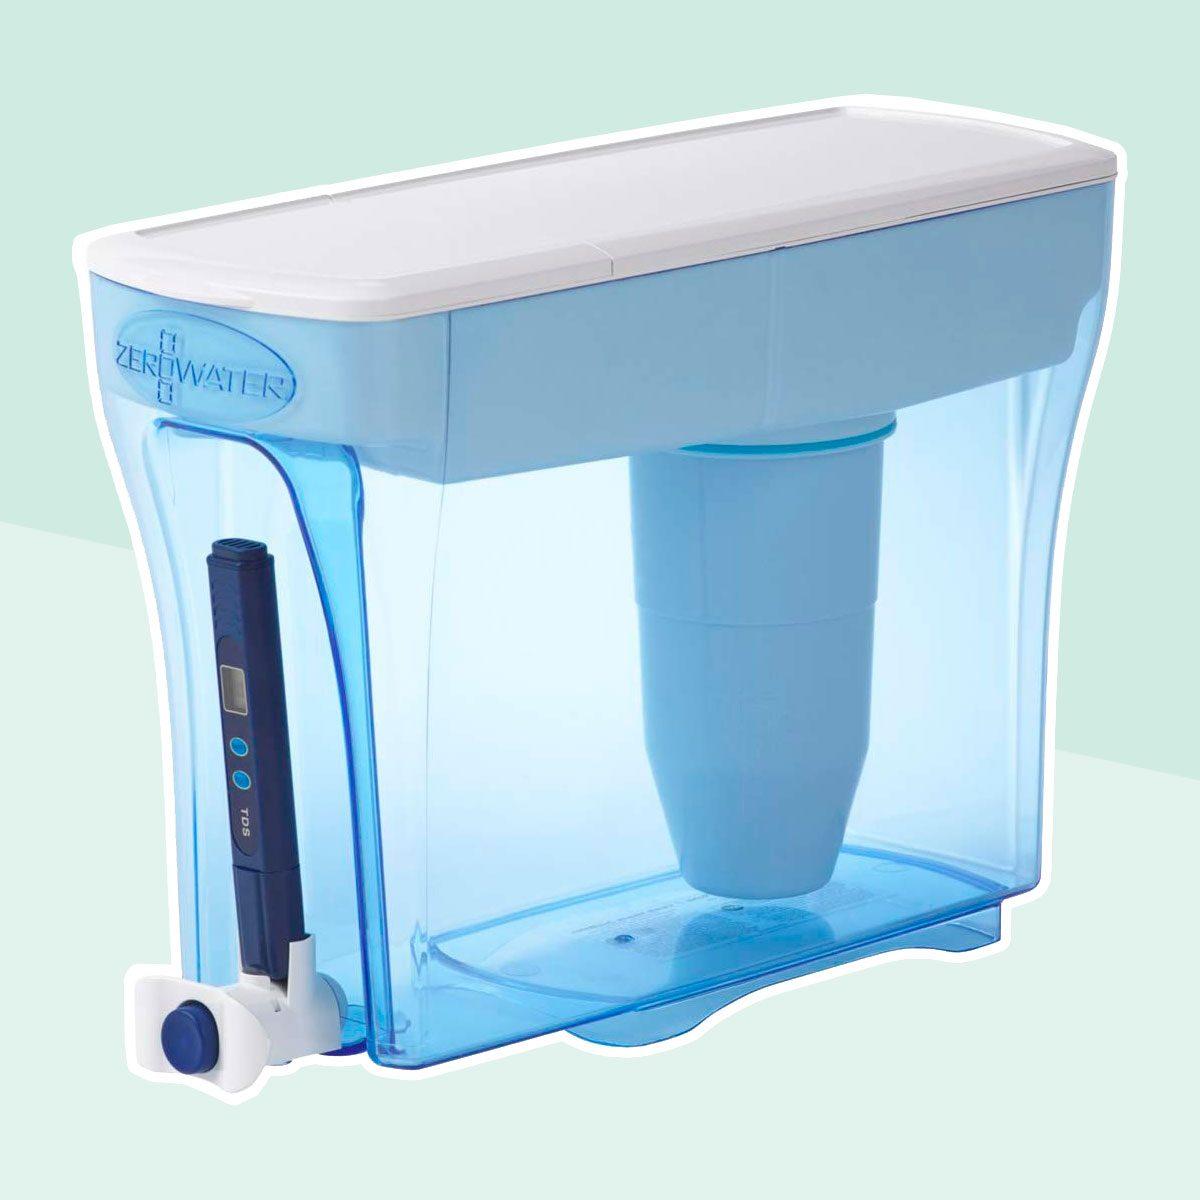 ZeroWater 23-Cup Dispenser